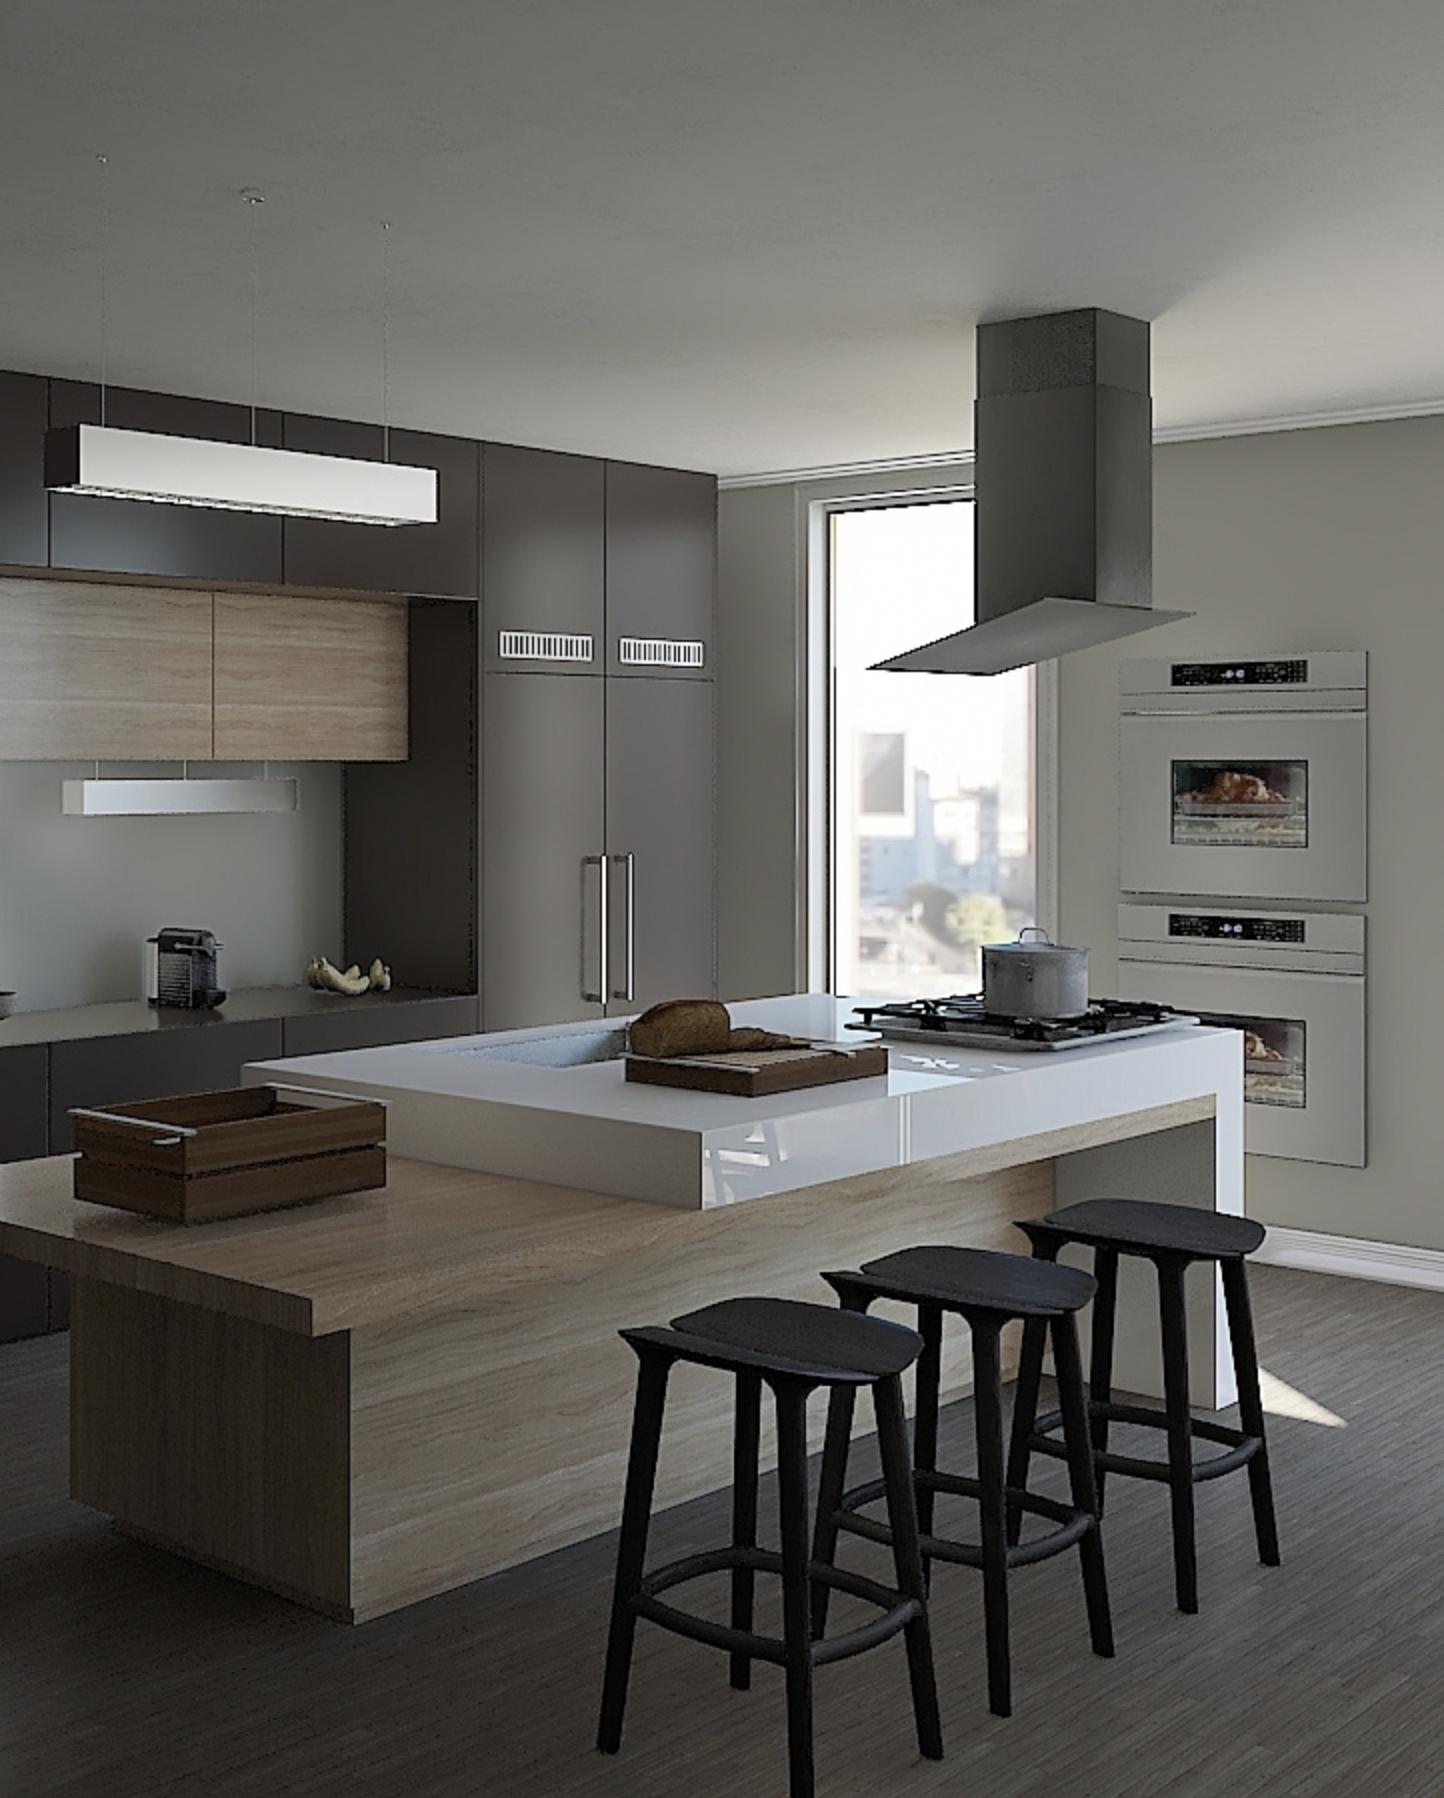 11 Simply Beautiful Modern Farmhouse Kitchen Style Ideas Cocinas Modernas Diseno Cocinas Modernas